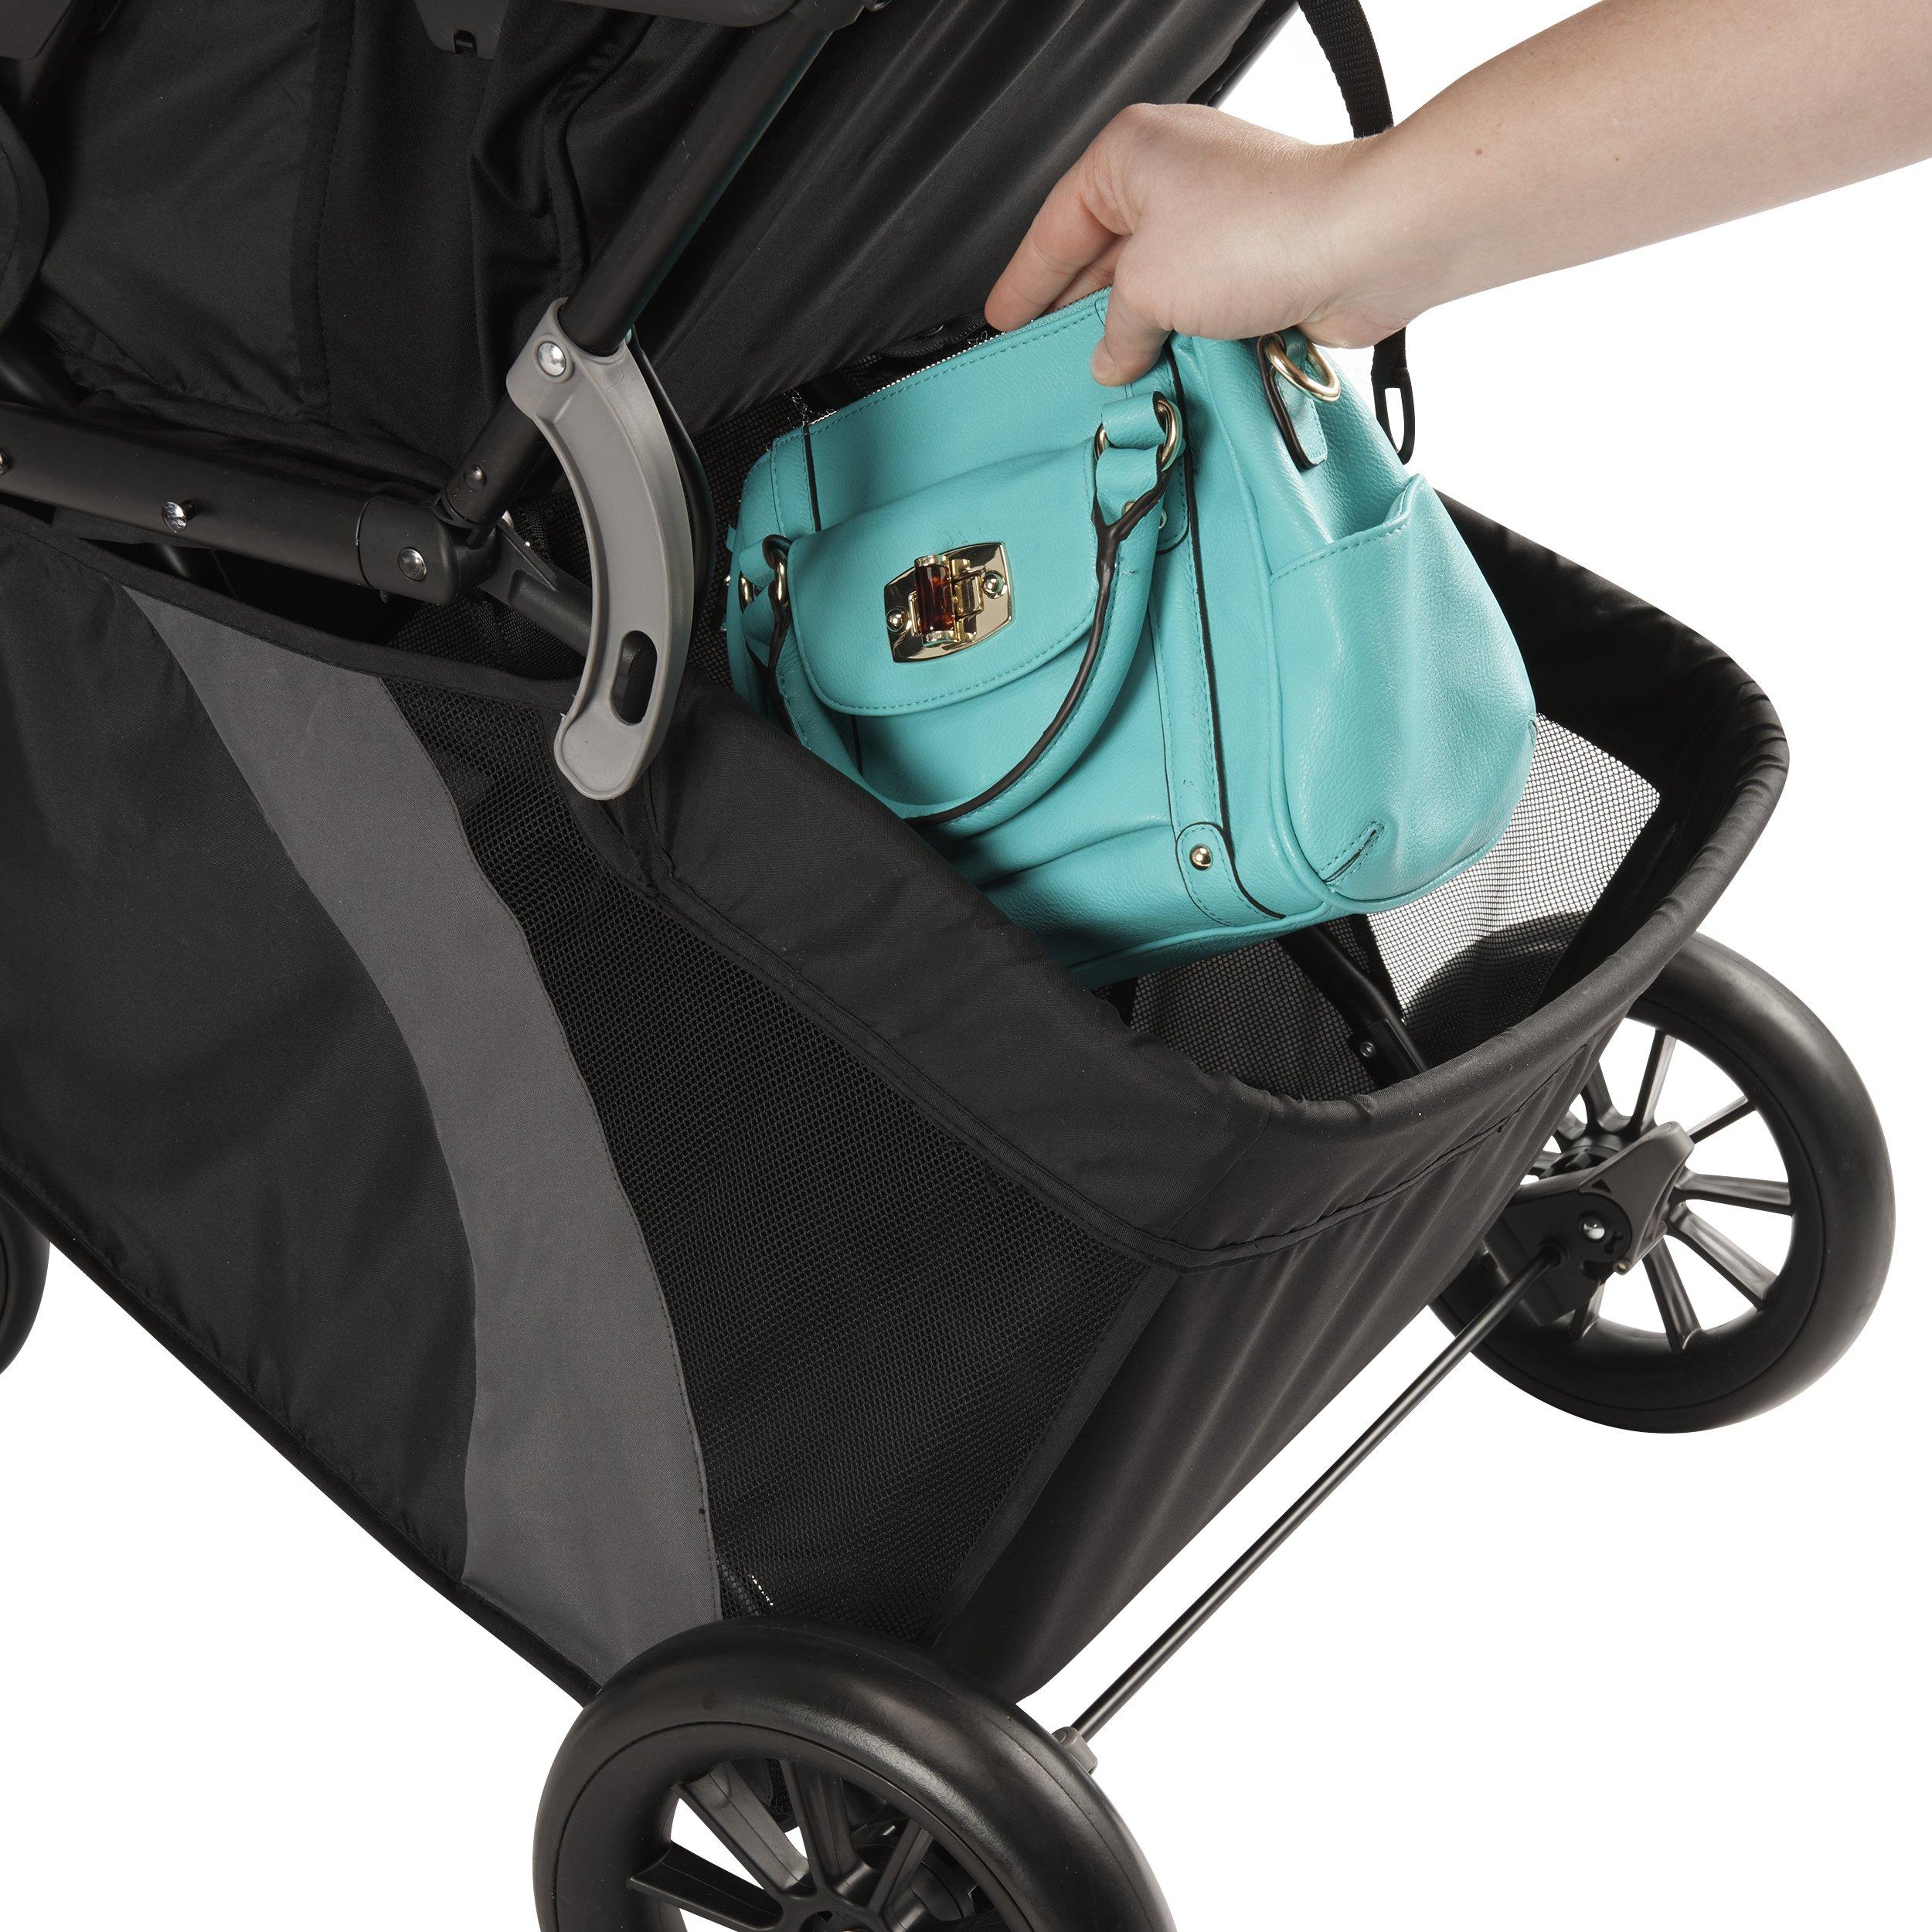 Evenflo Advanced SensorSafe Epic Travel System with LiteMax Infant Car Seat, Jet by Evenflo (Image #12)